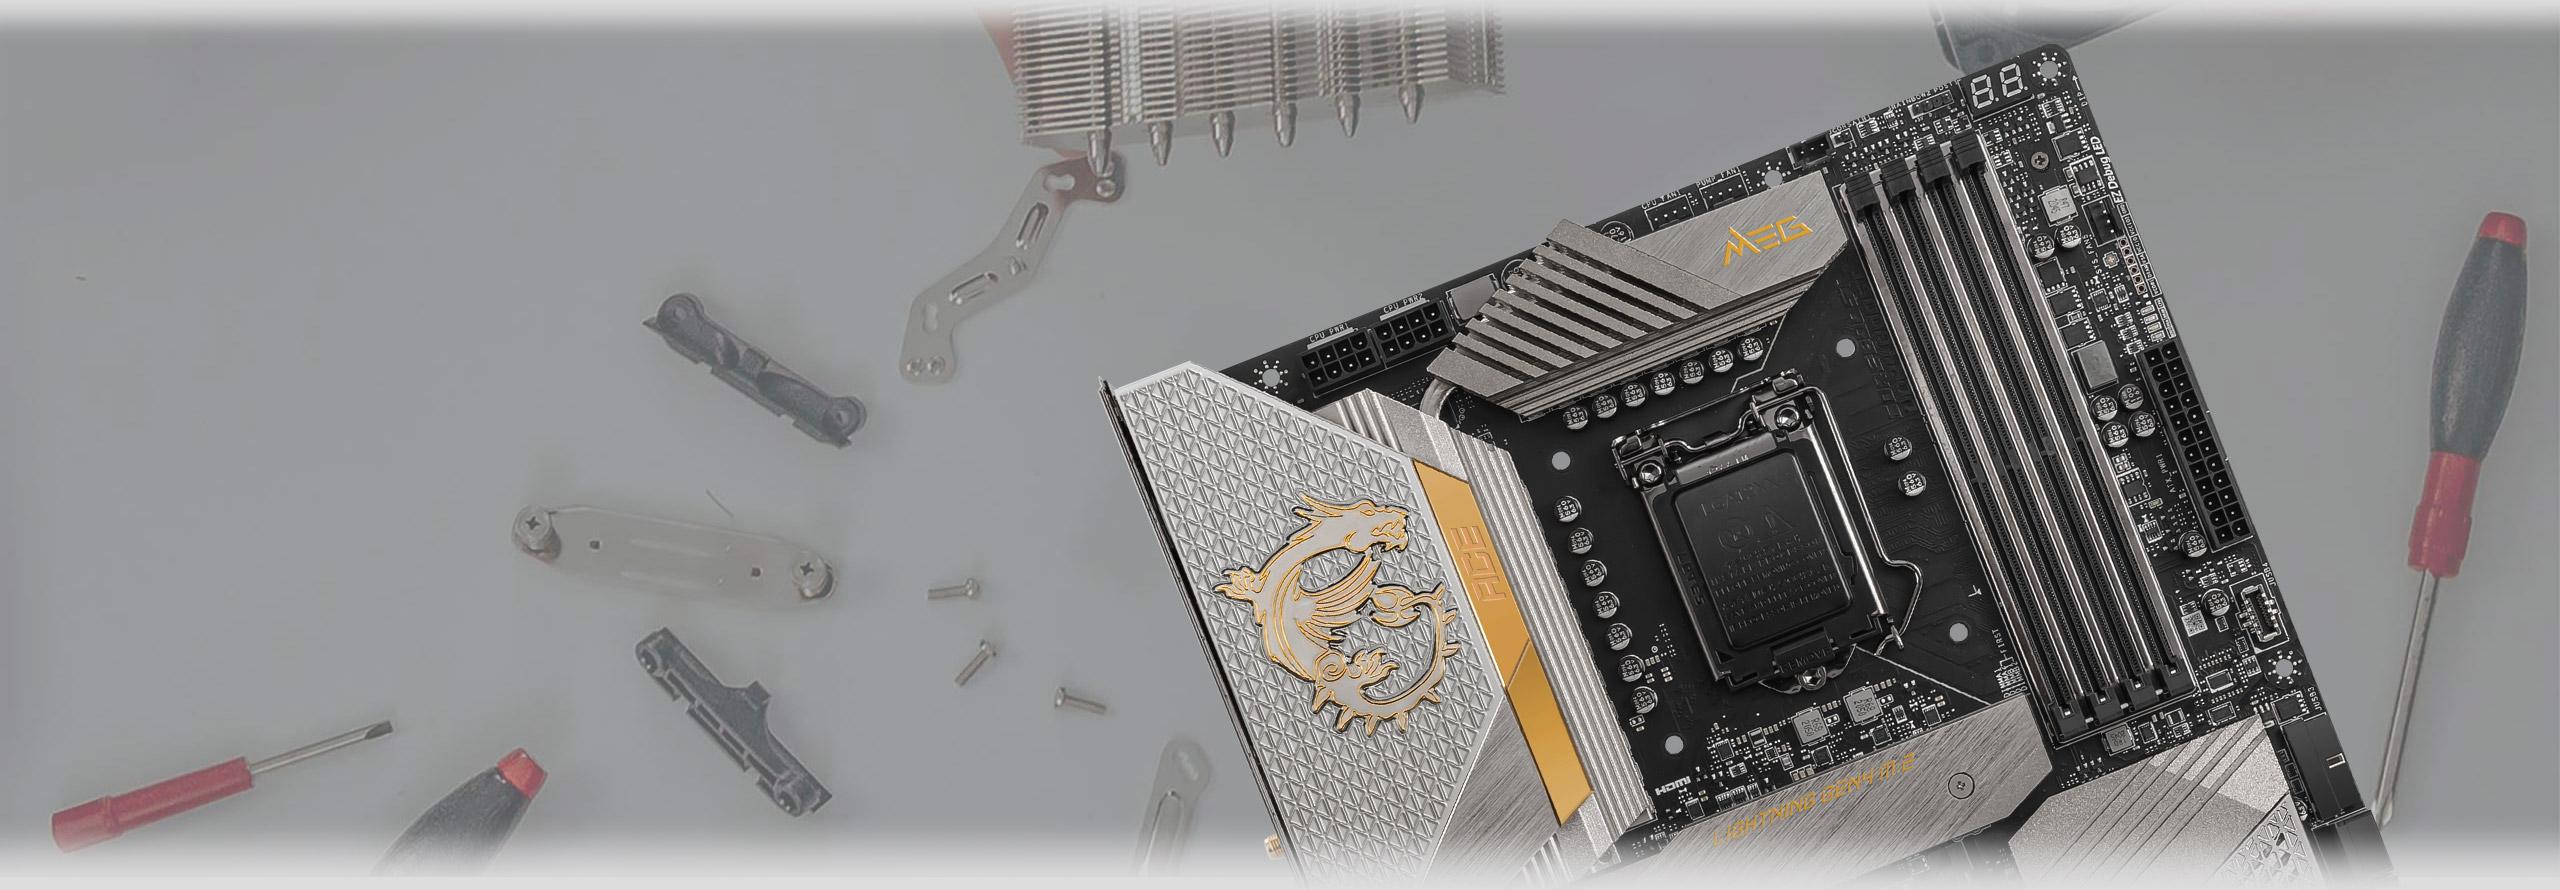 MSI MB hardwarekv